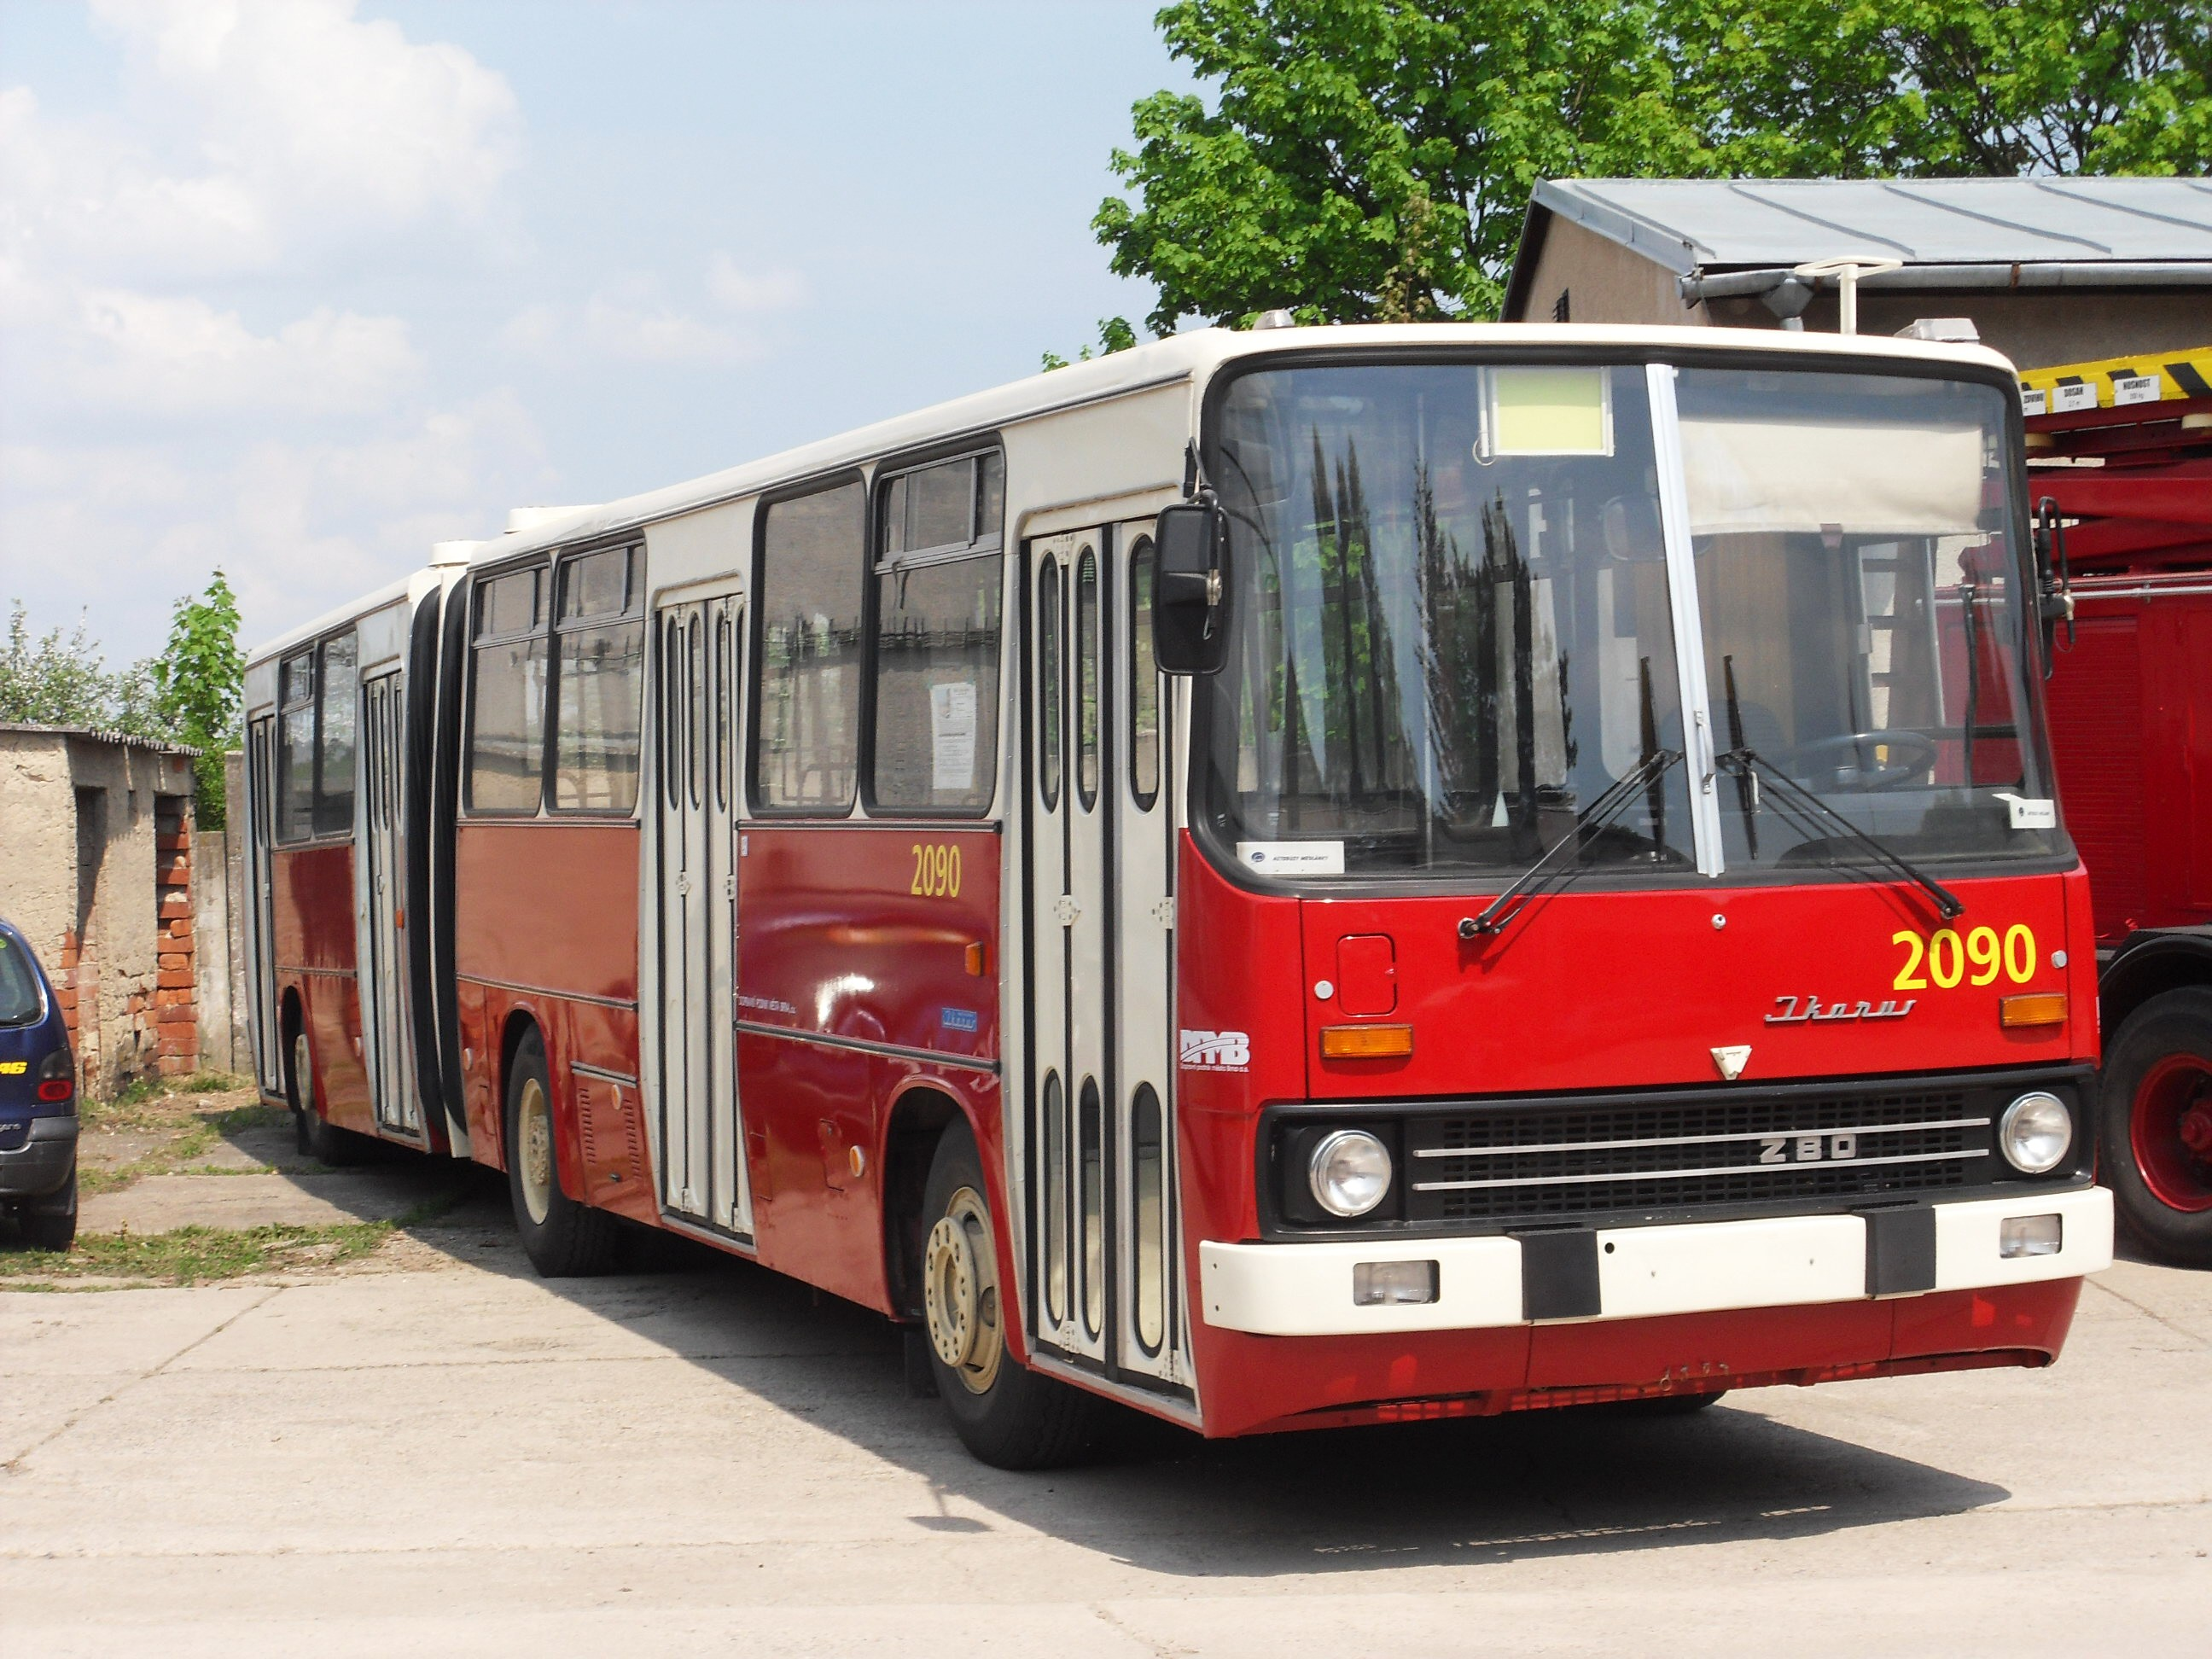 File:Brno, Řečkovice, depozitář TMB, Ikarus 280 č. 2090 (01